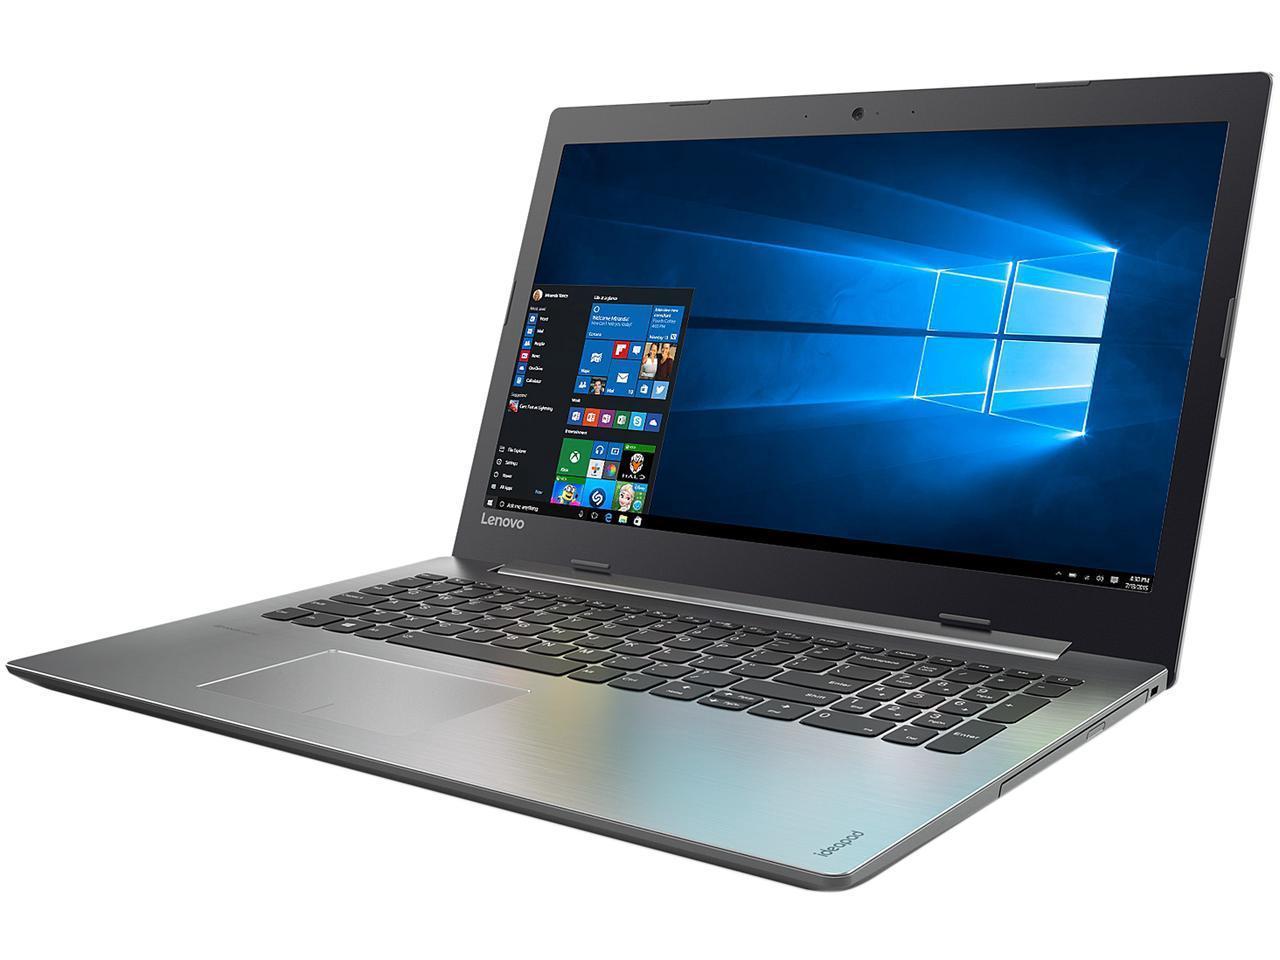 "Lenovo Laptop IdeaPad 320 80XL03BQUS Intel Core i7 7th Gen 7500U (2.70 GHz) 12 GB Memory 256 GB SSD NVIDIA GeForce 940MX 15.6"" Windows 10 Home $600"